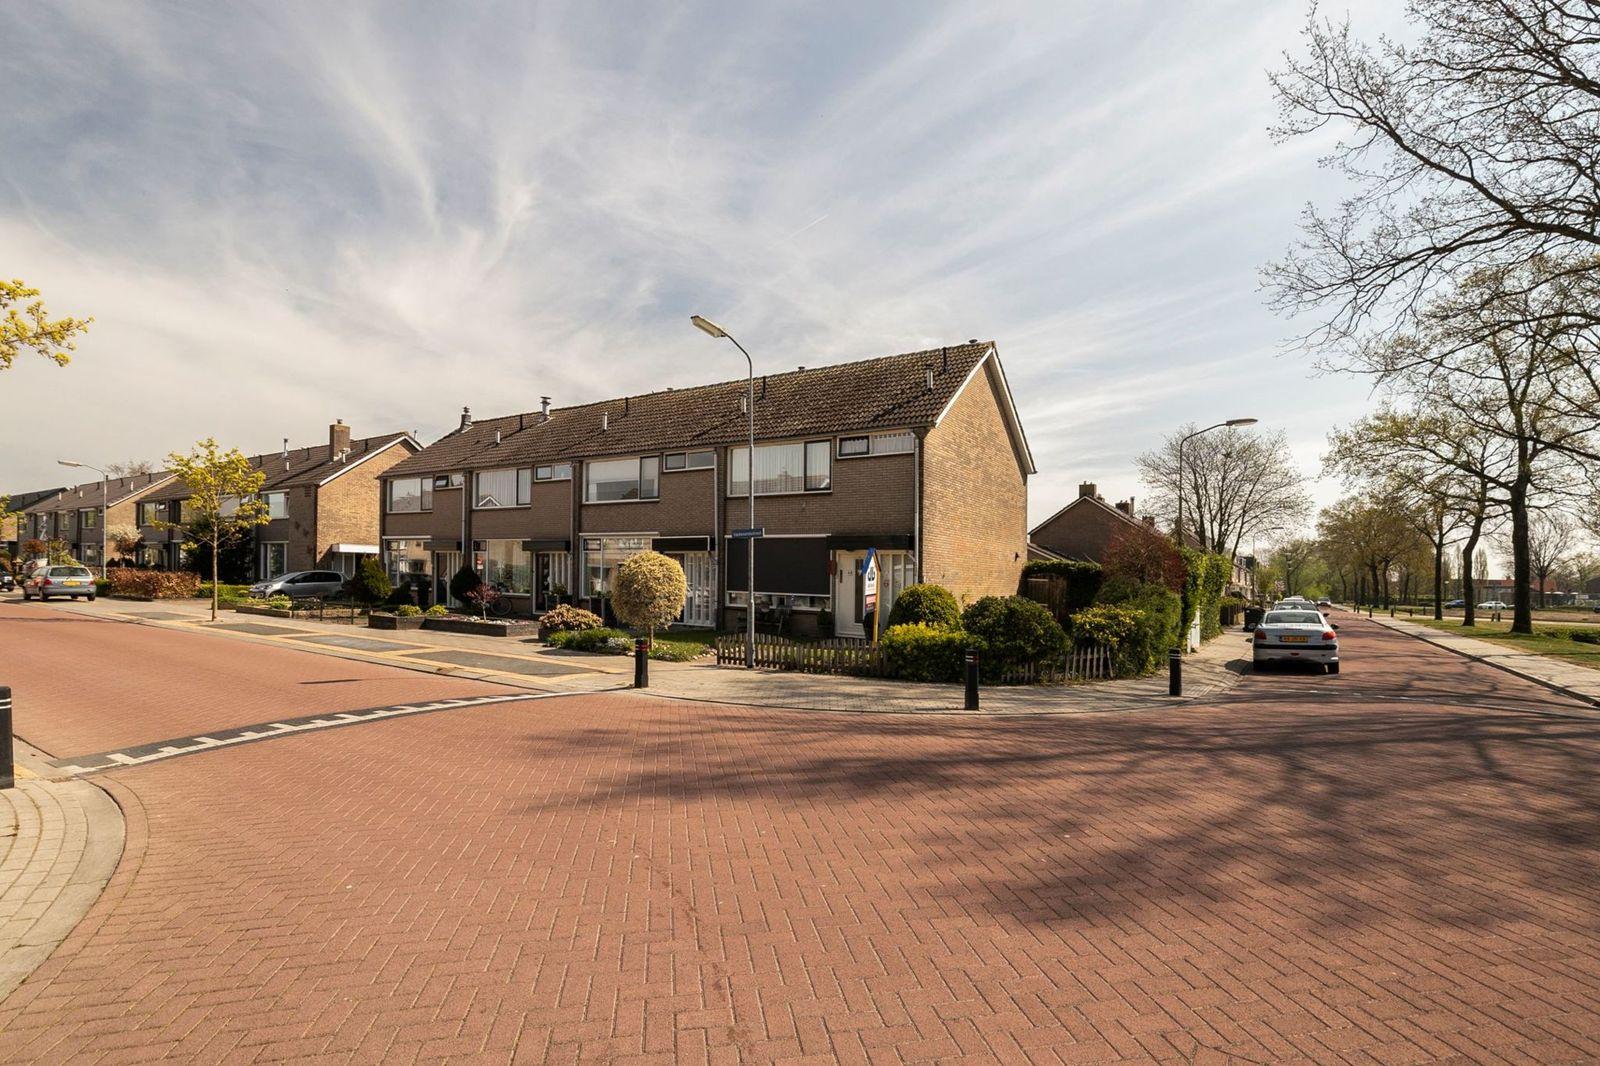 Vackenordestraat, Elburg